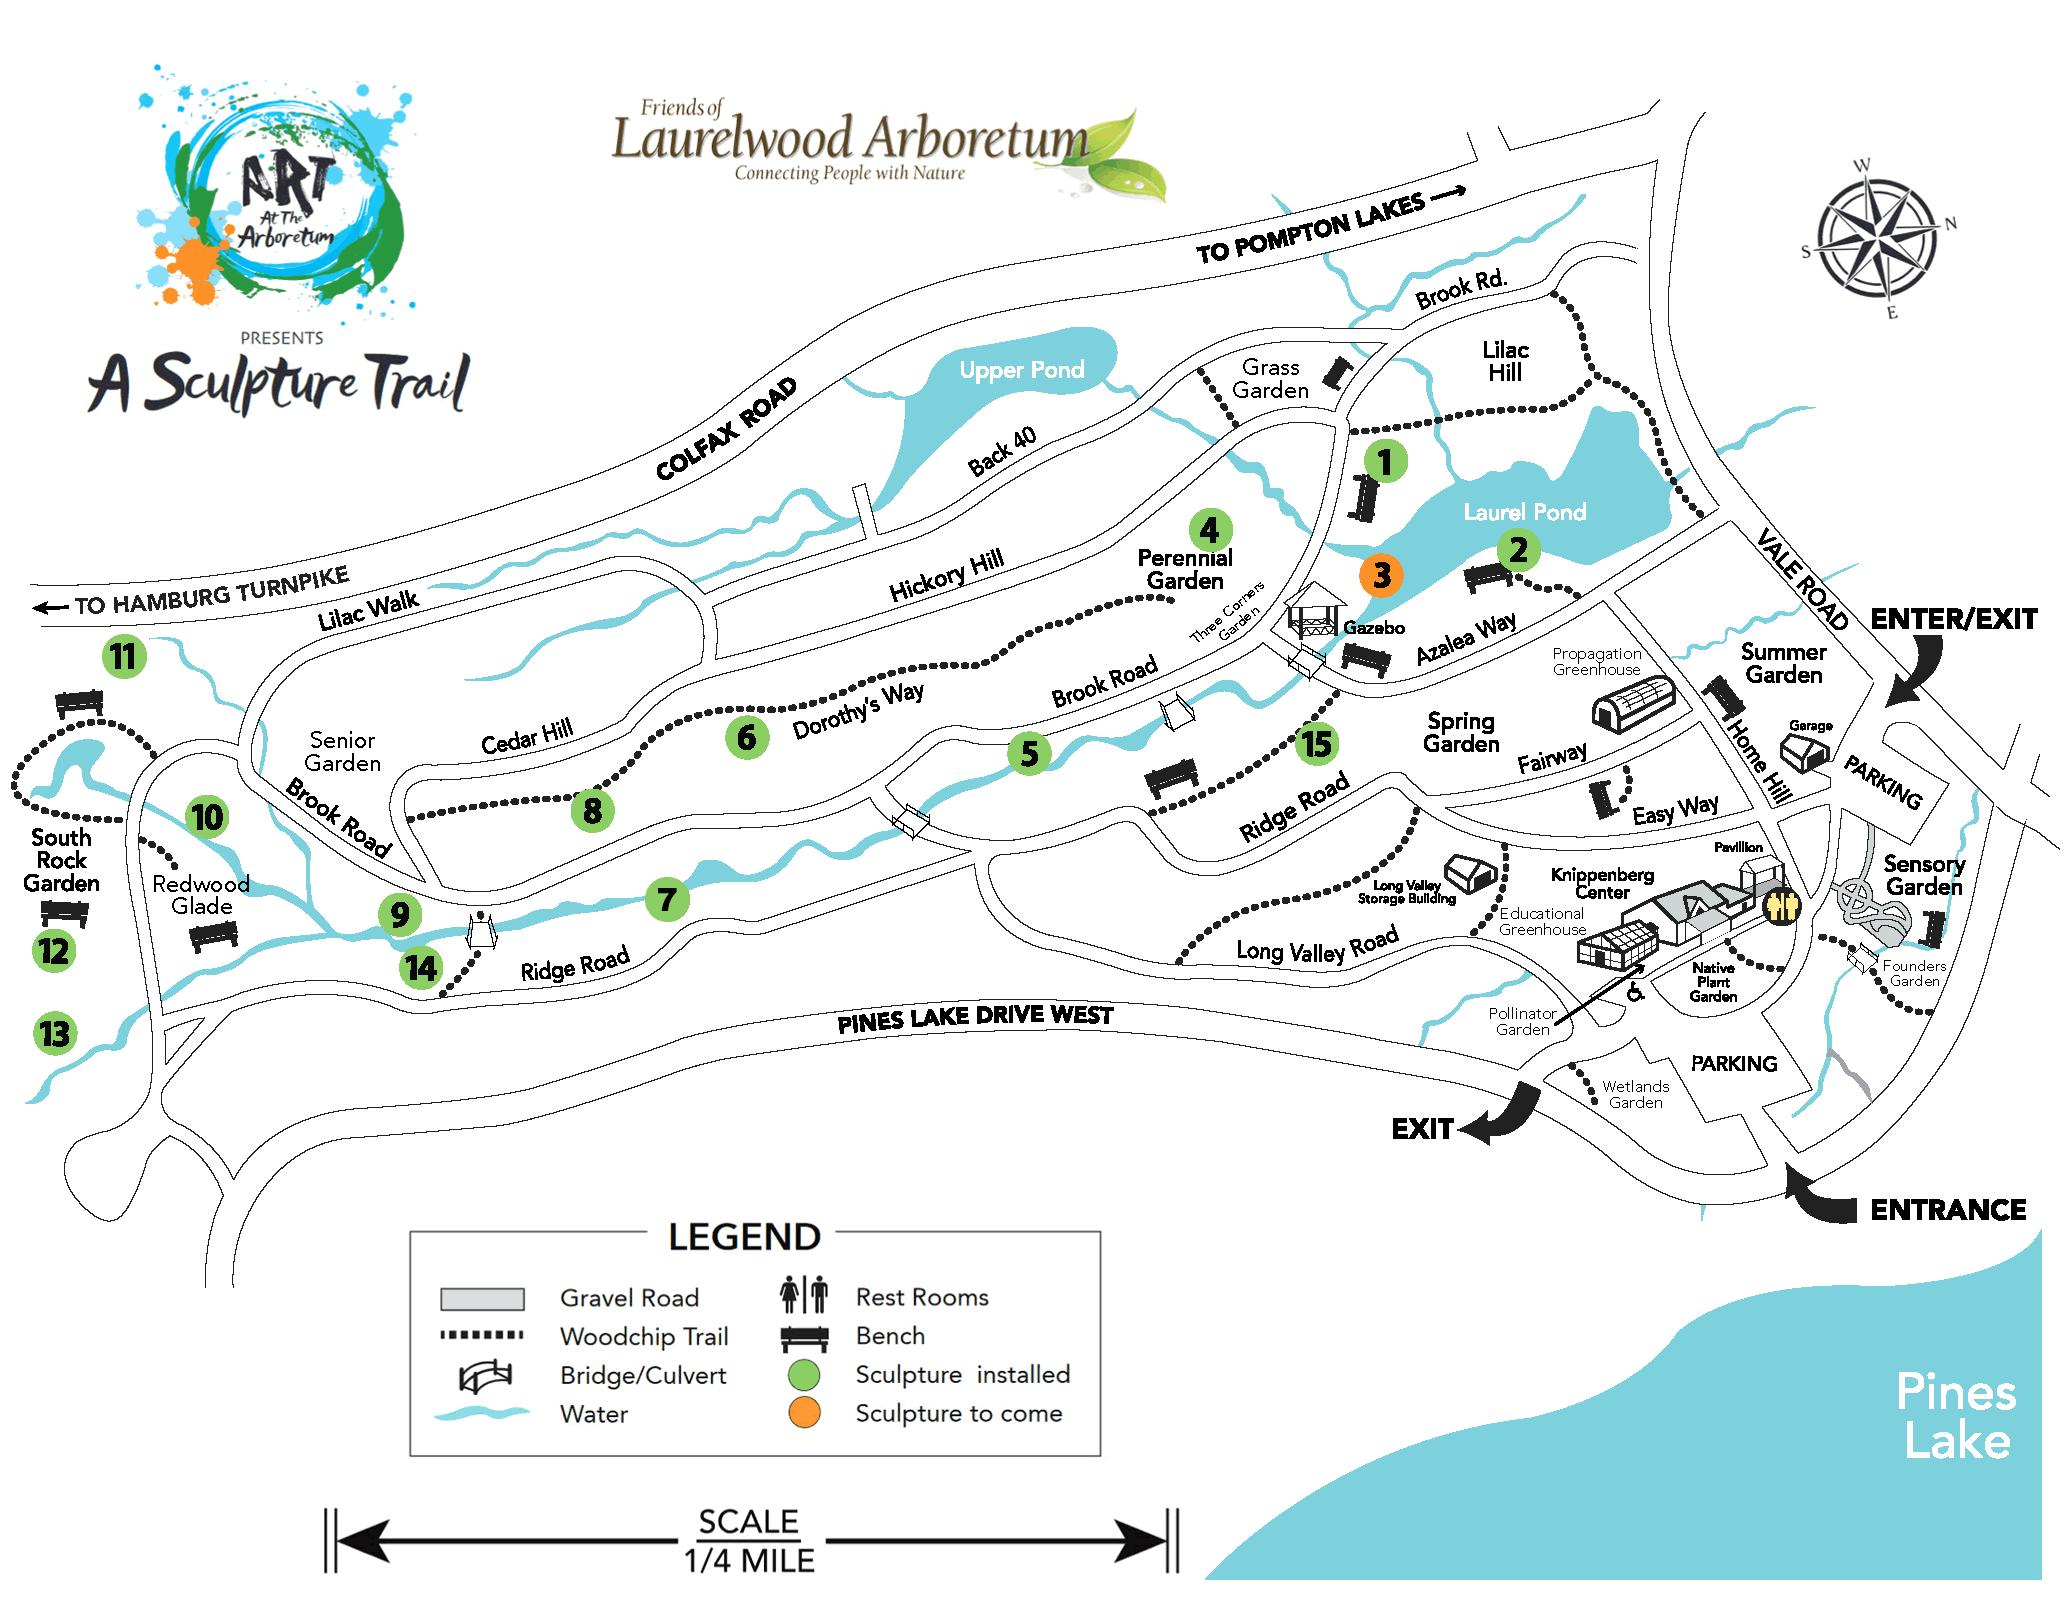 Sculpture Trail map w/ hotspots